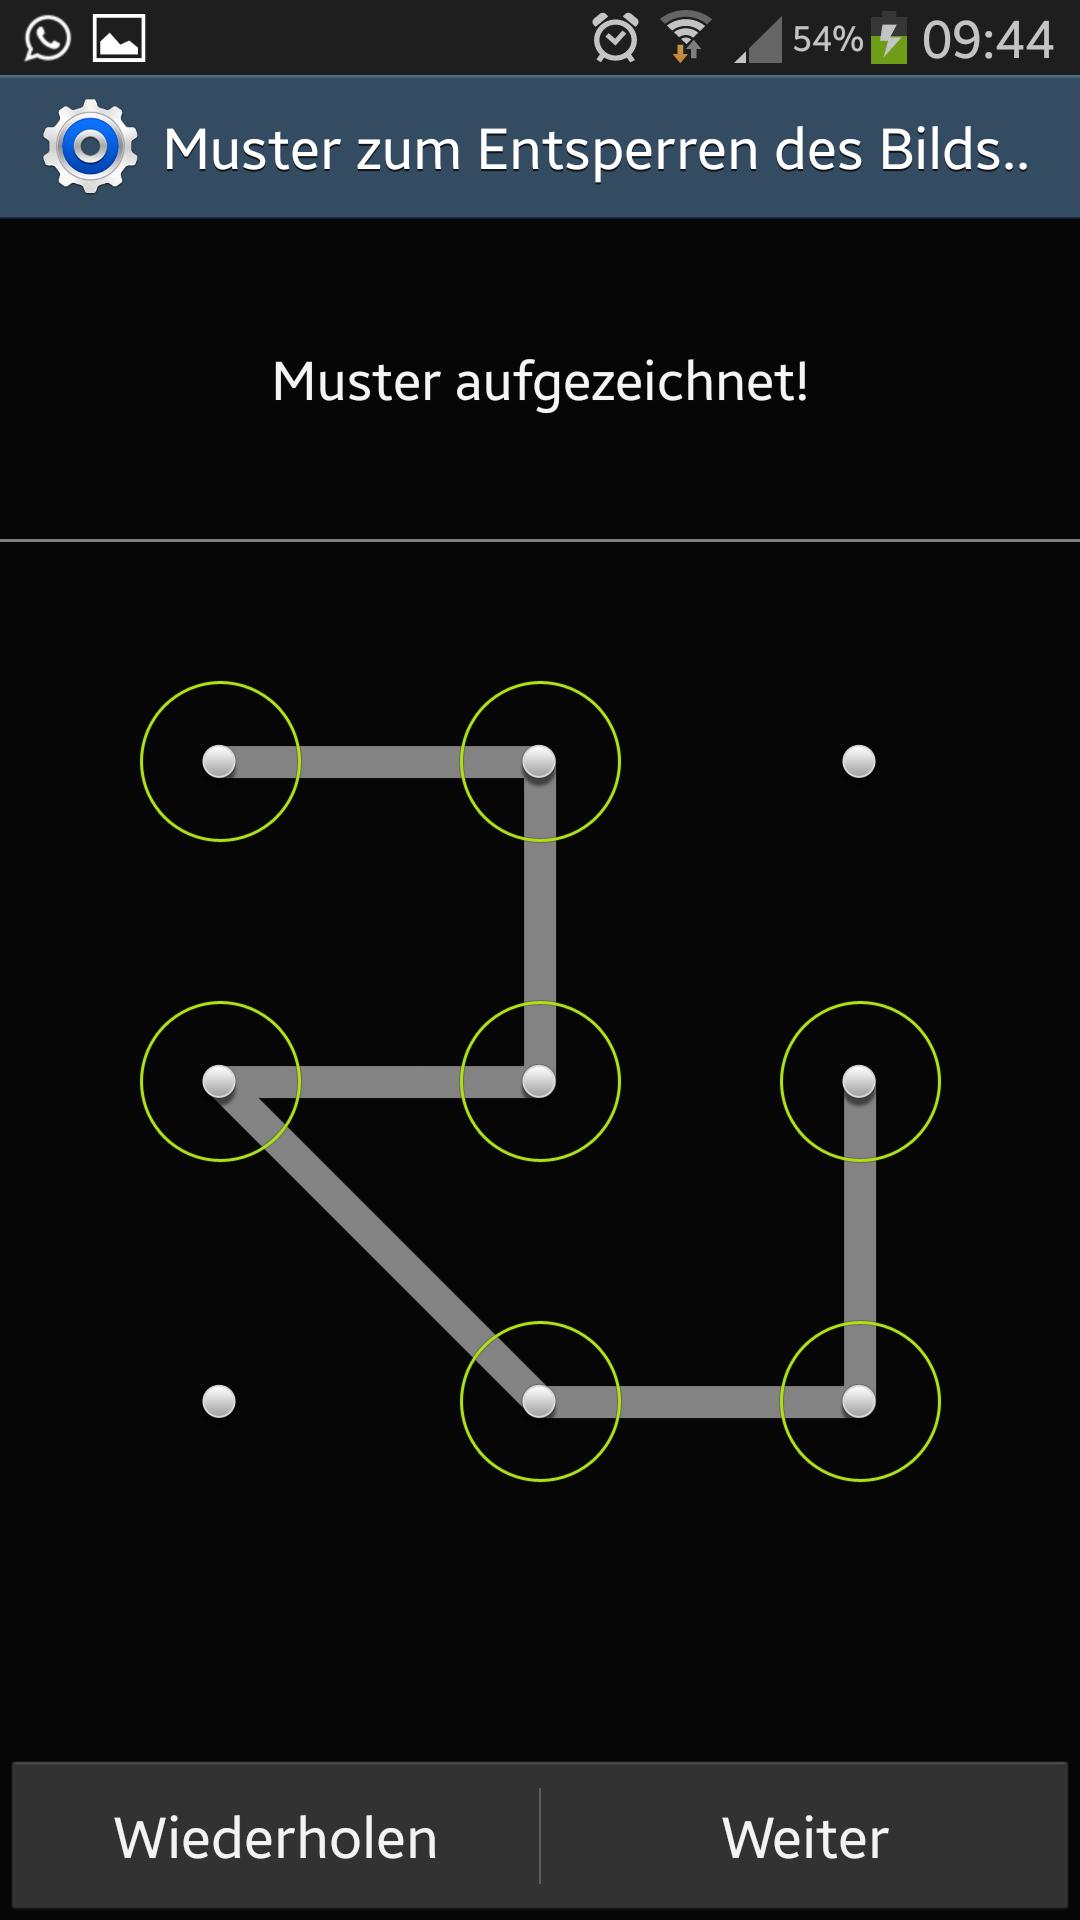 passwort muster pin so sichert ihr euer android gert richtig ab - Handyhllen Muster